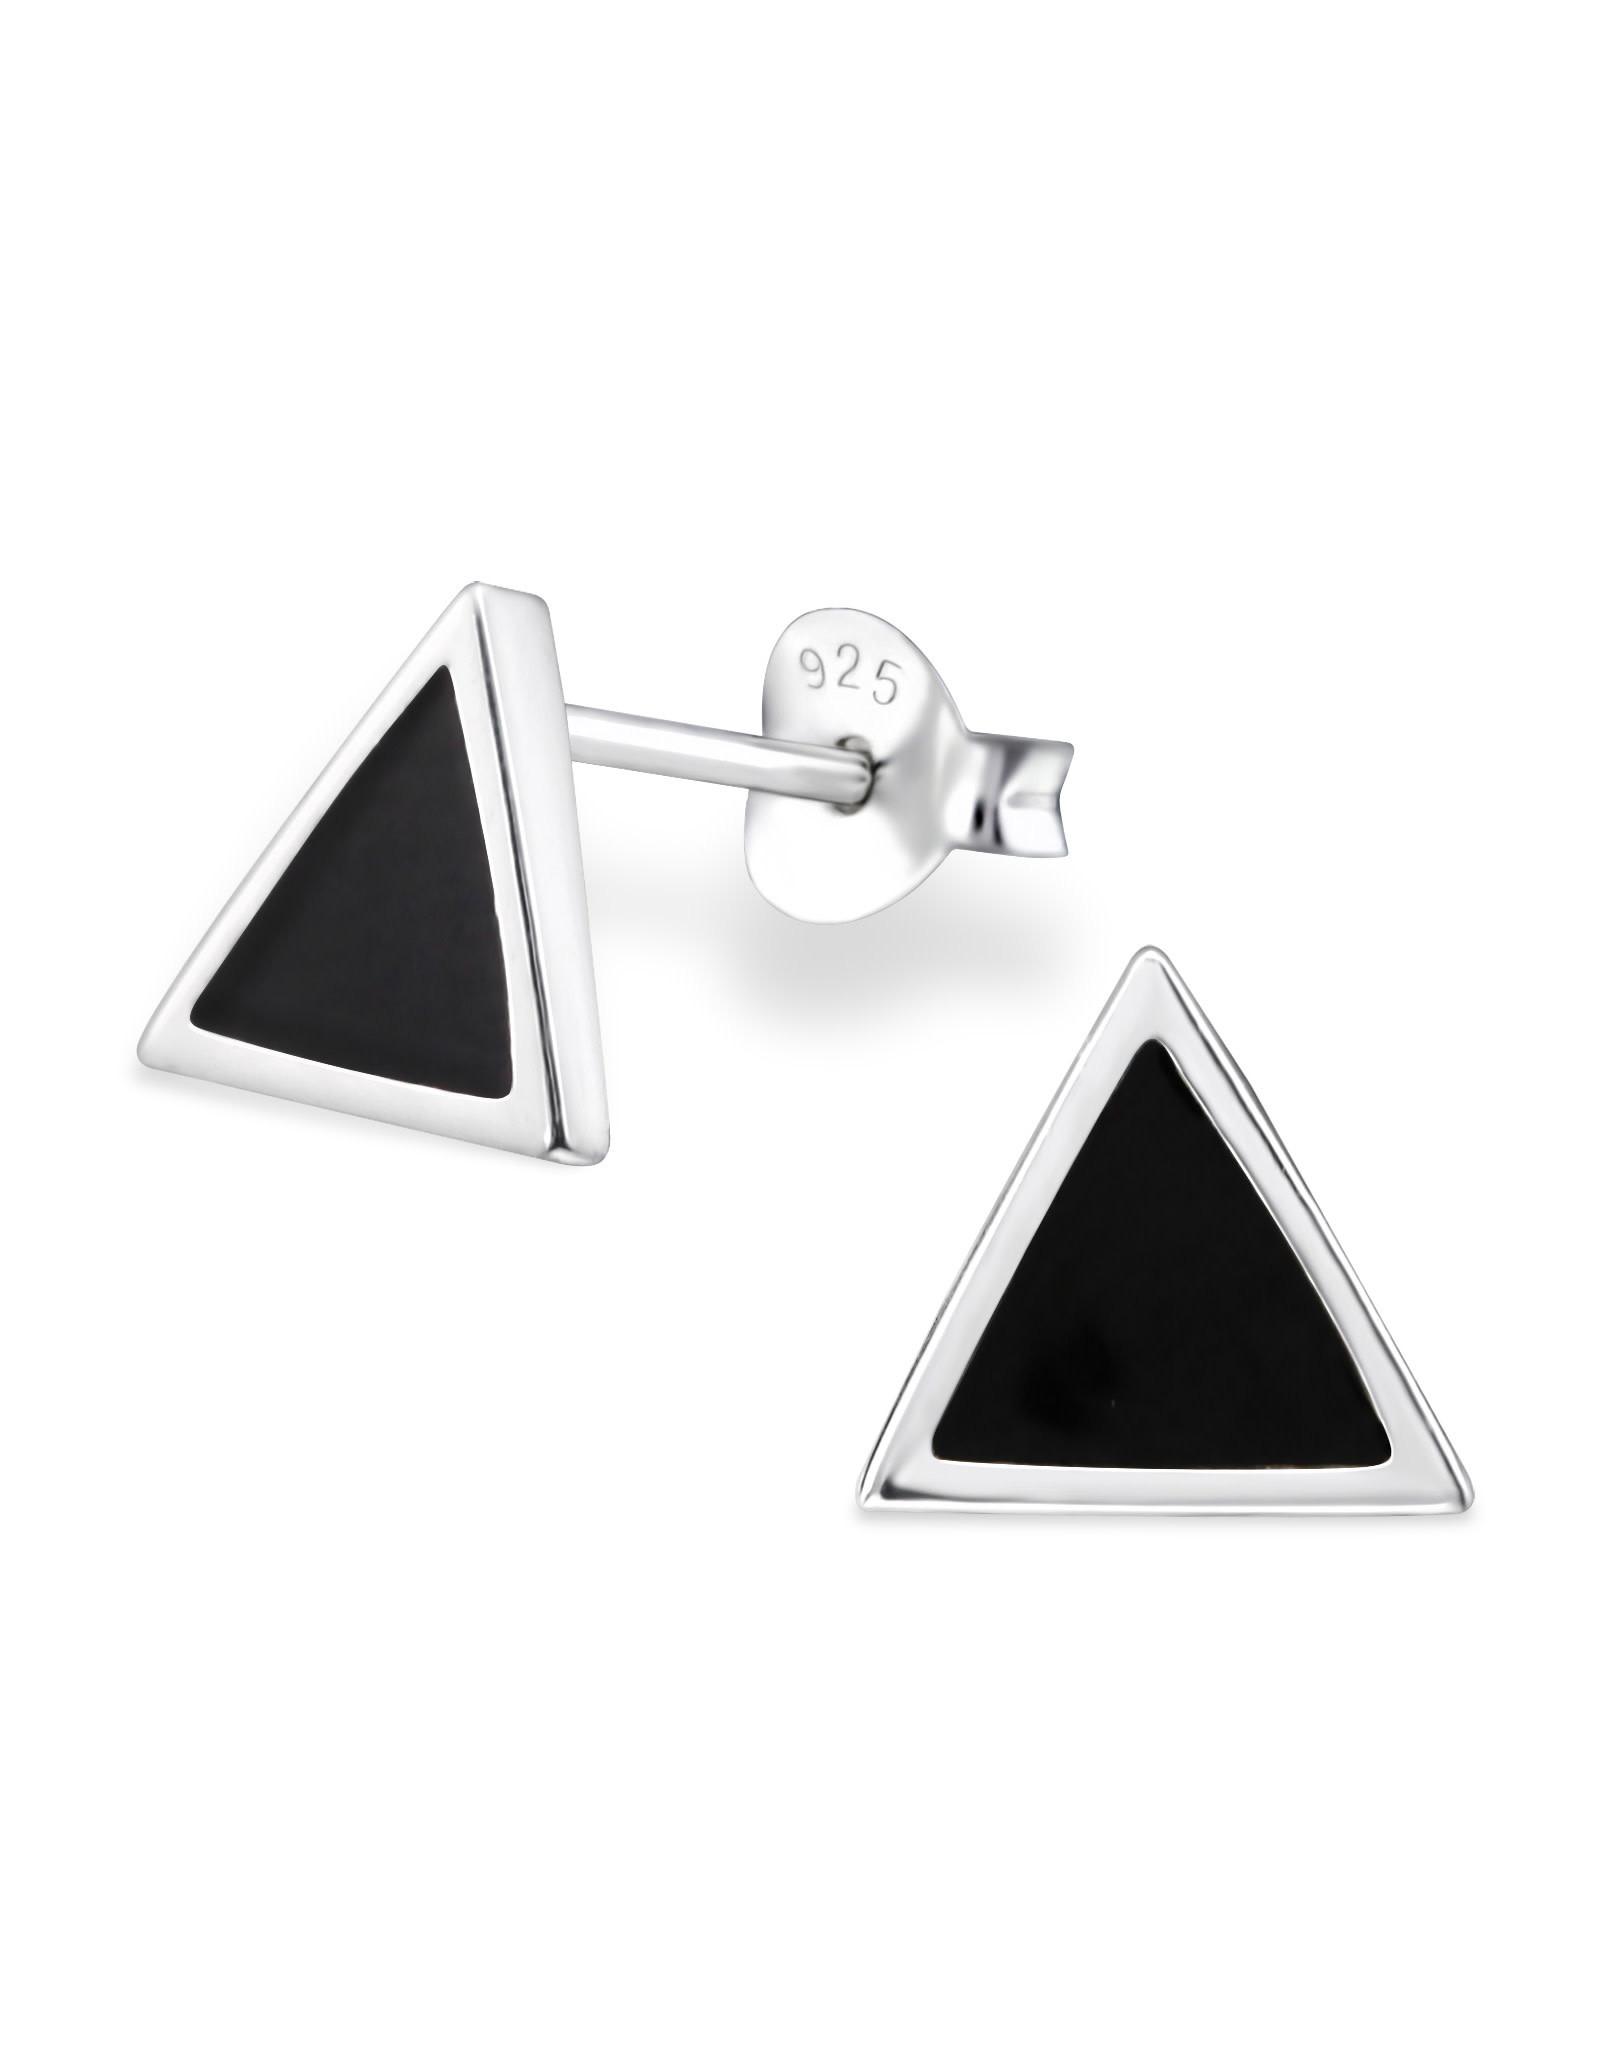 Stekertjes zilver driehoek zwart